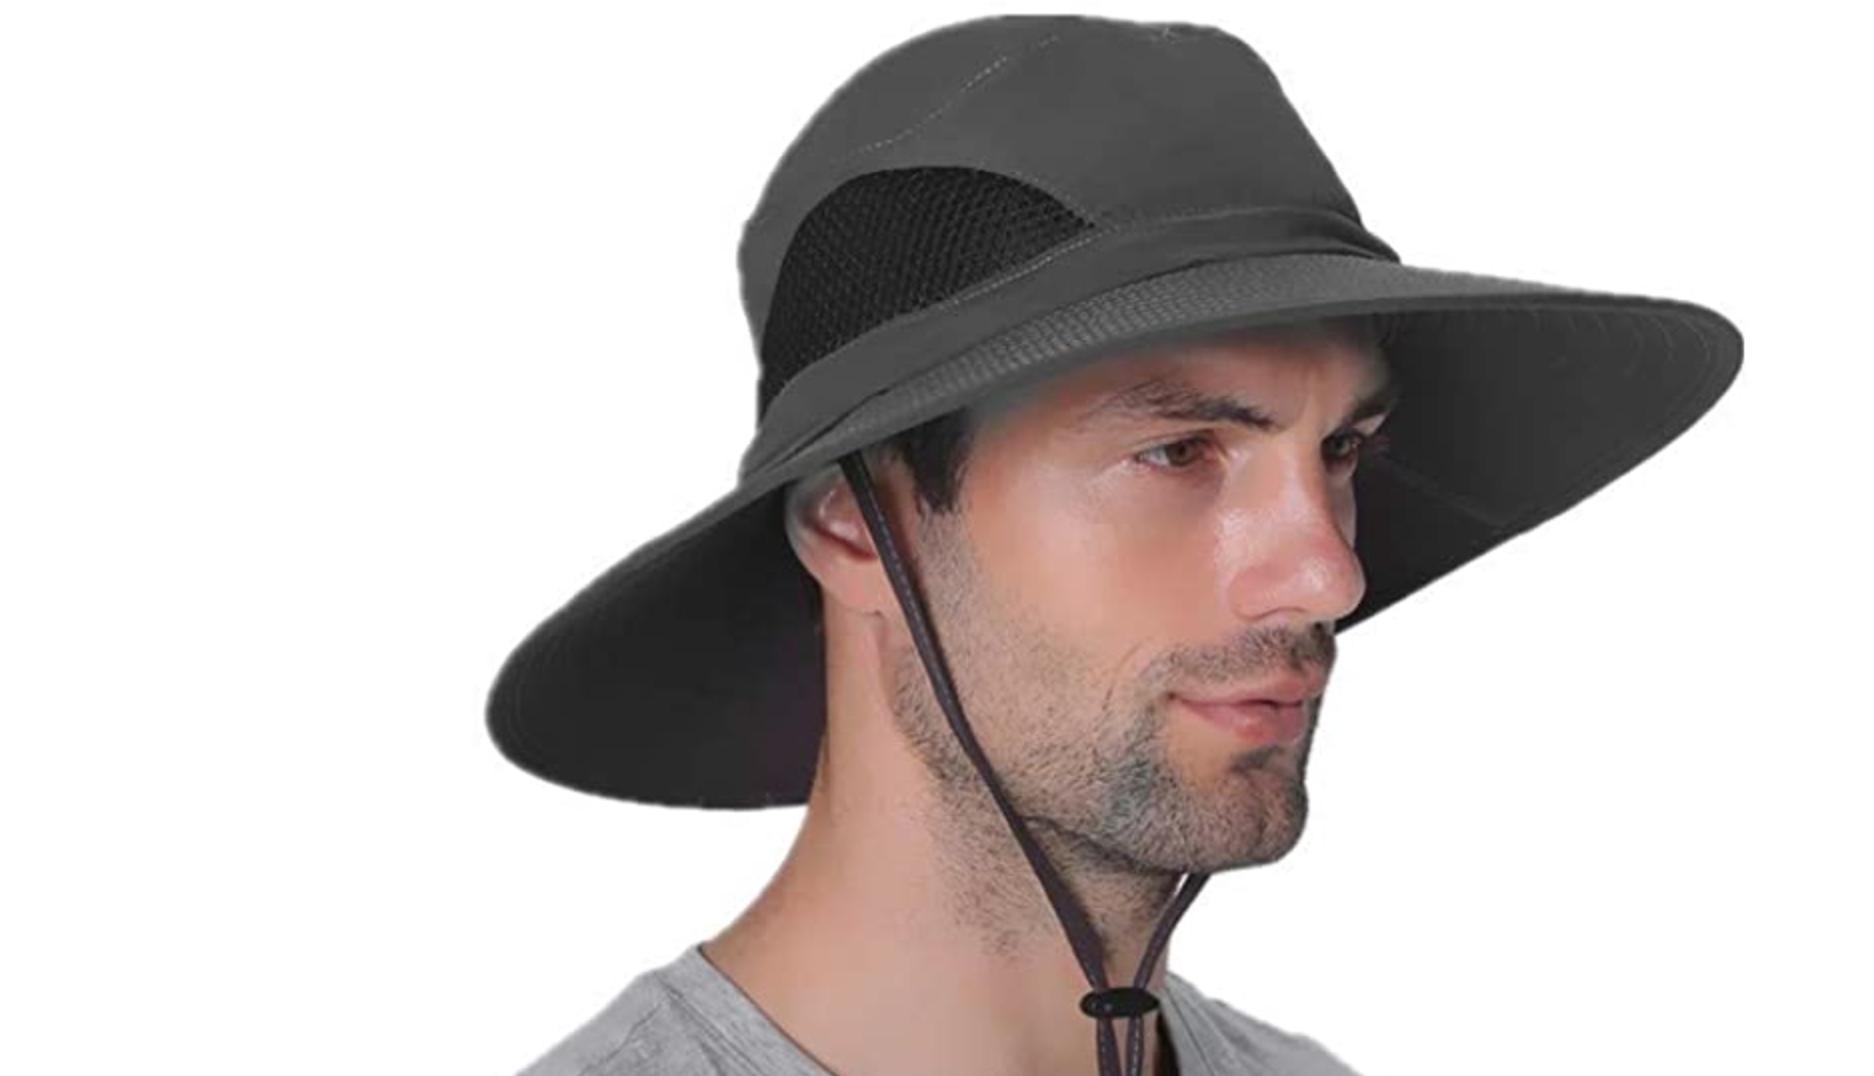 KPWIN Waterproof Fishing Bucket Hat with UPF 50 UV Protection